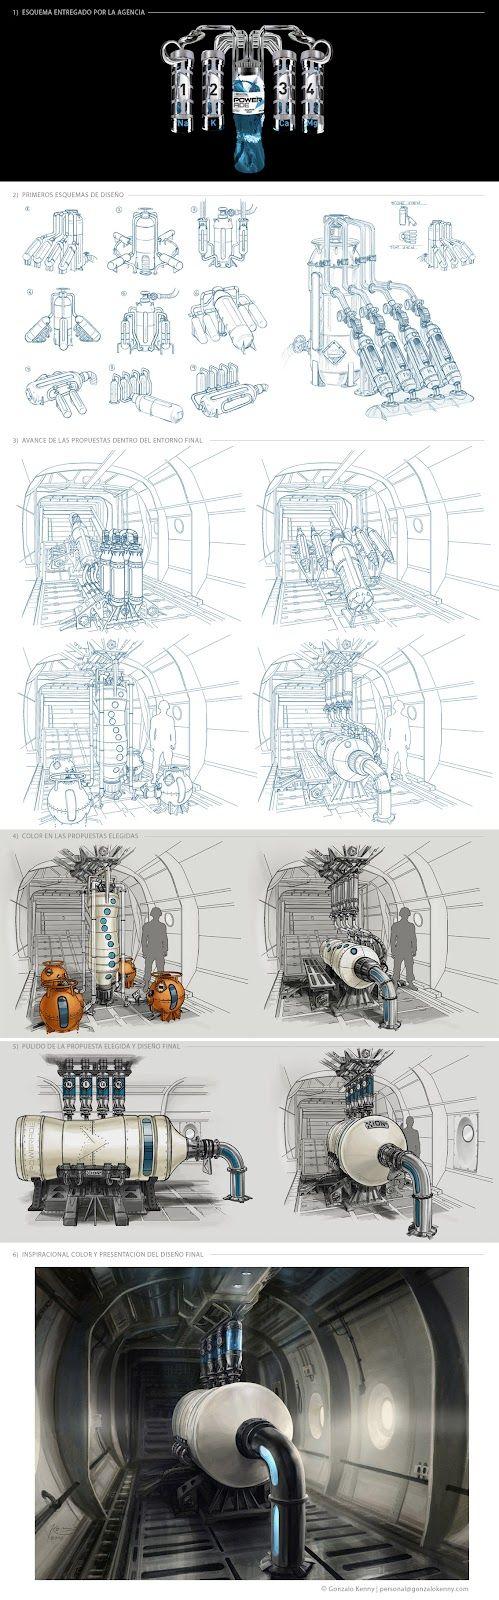 Concept design process